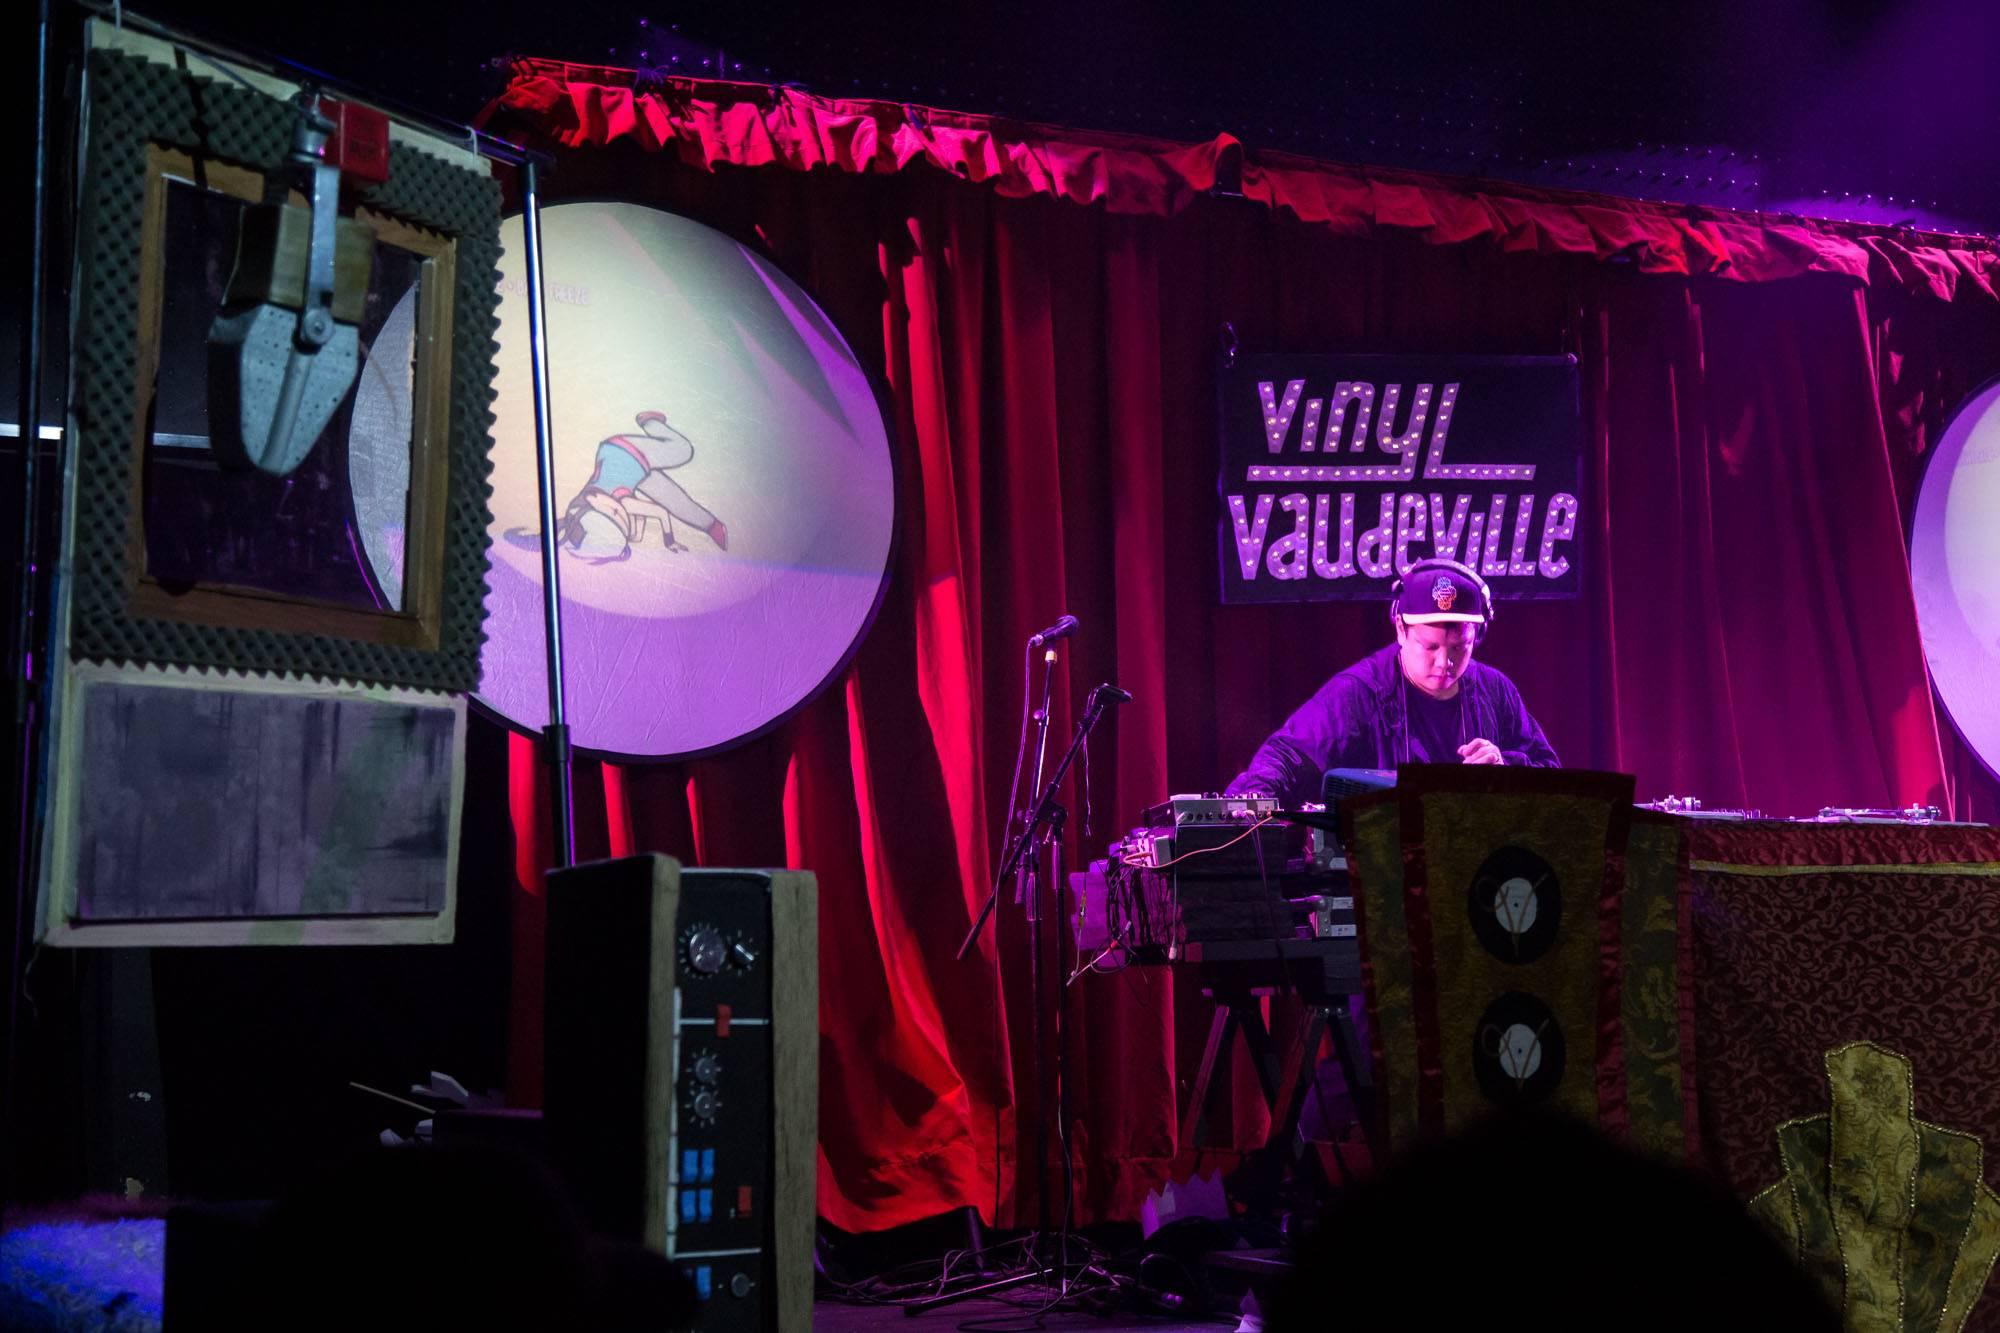 Kid Koala at Venue, Vancouver, May 4 2018. Kirk Chantraine photo.